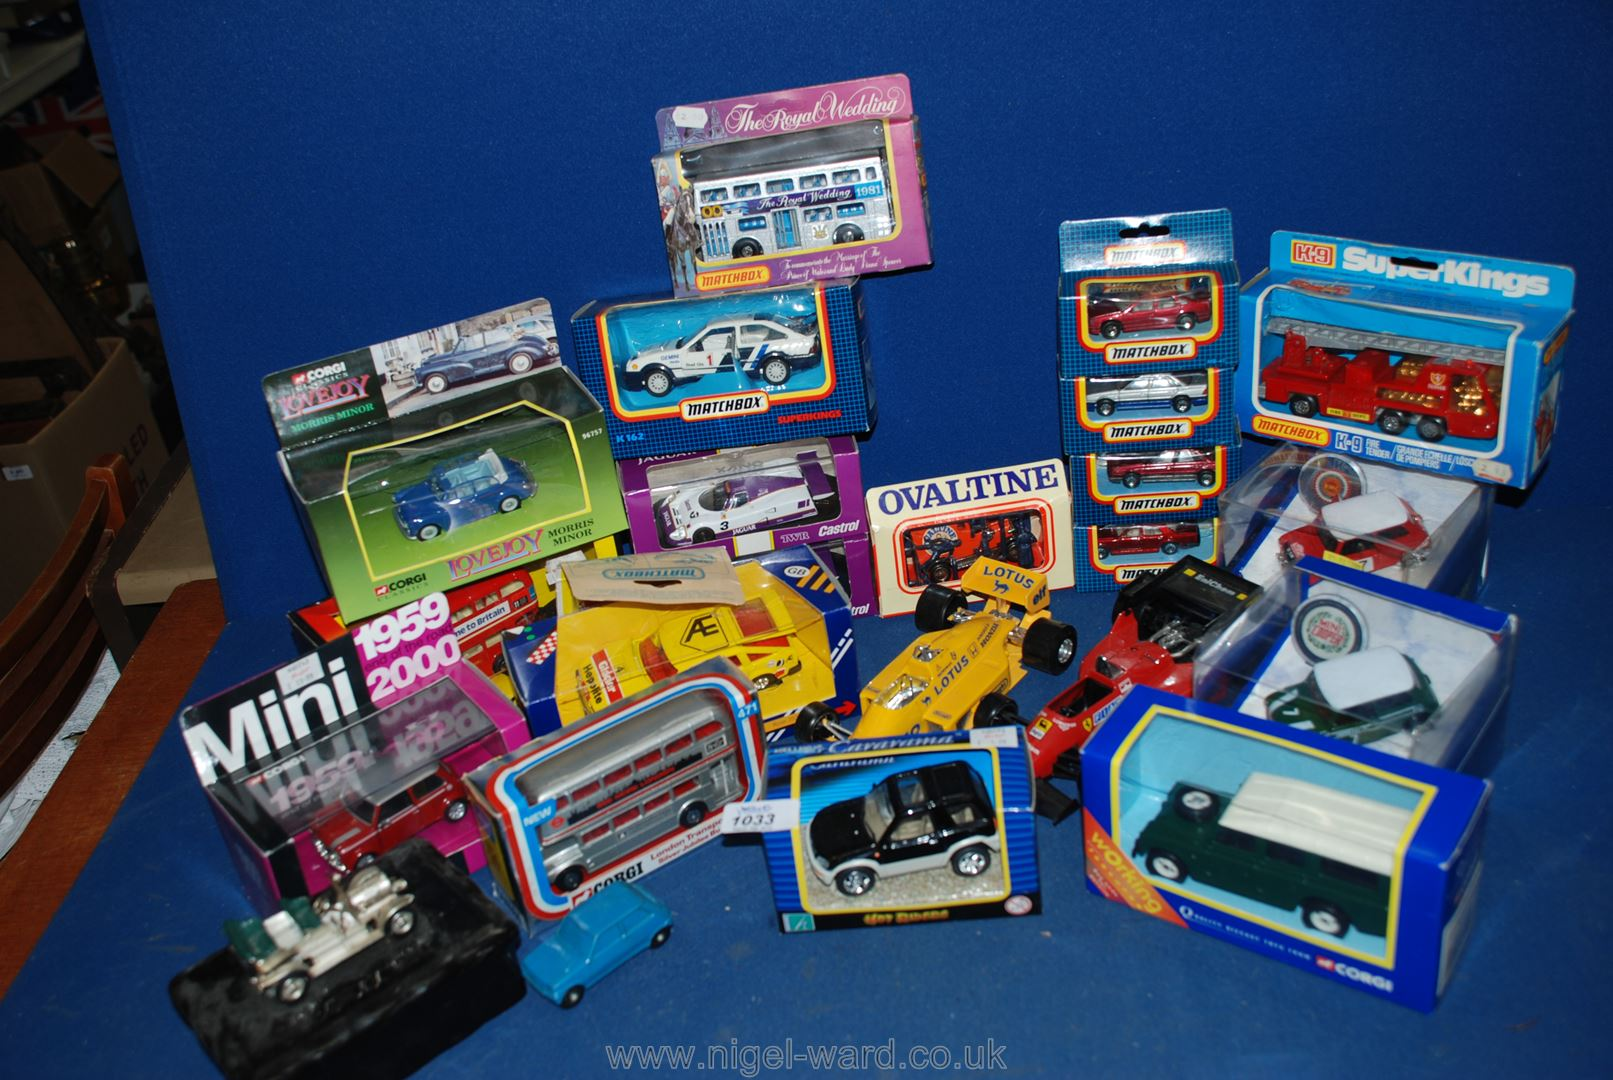 Lot 1033 - A quantity of Corgi and Matchbox toy cars including; Mini, Fiat, Lotus, Landrover, etc.